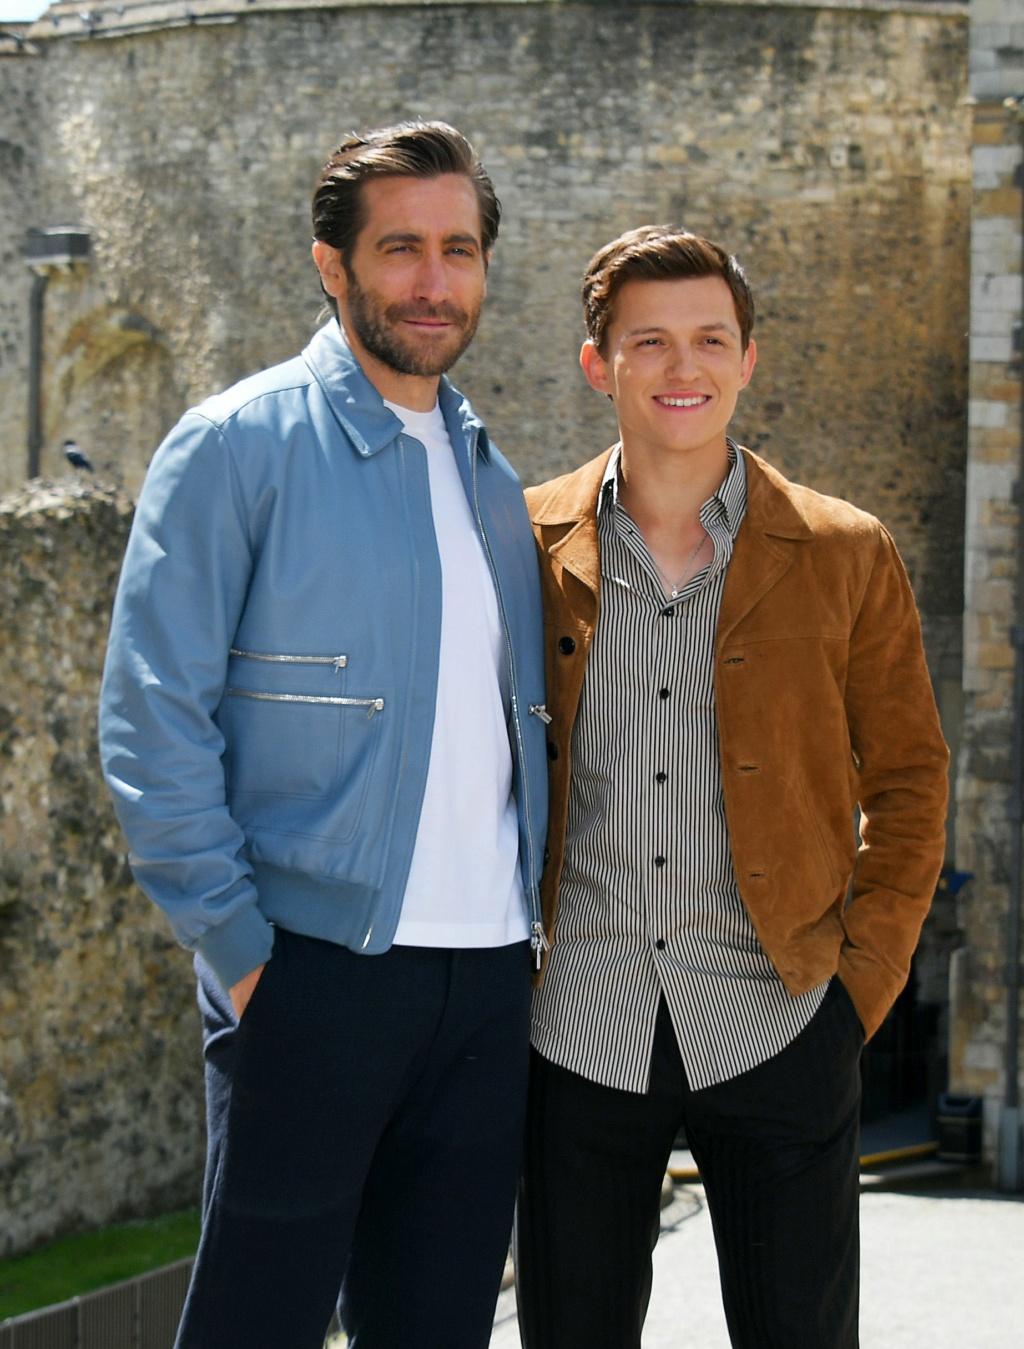 ¿Cuánto mide Jake Gyllenhaal?  - Real height - Página 2 Gettyi11